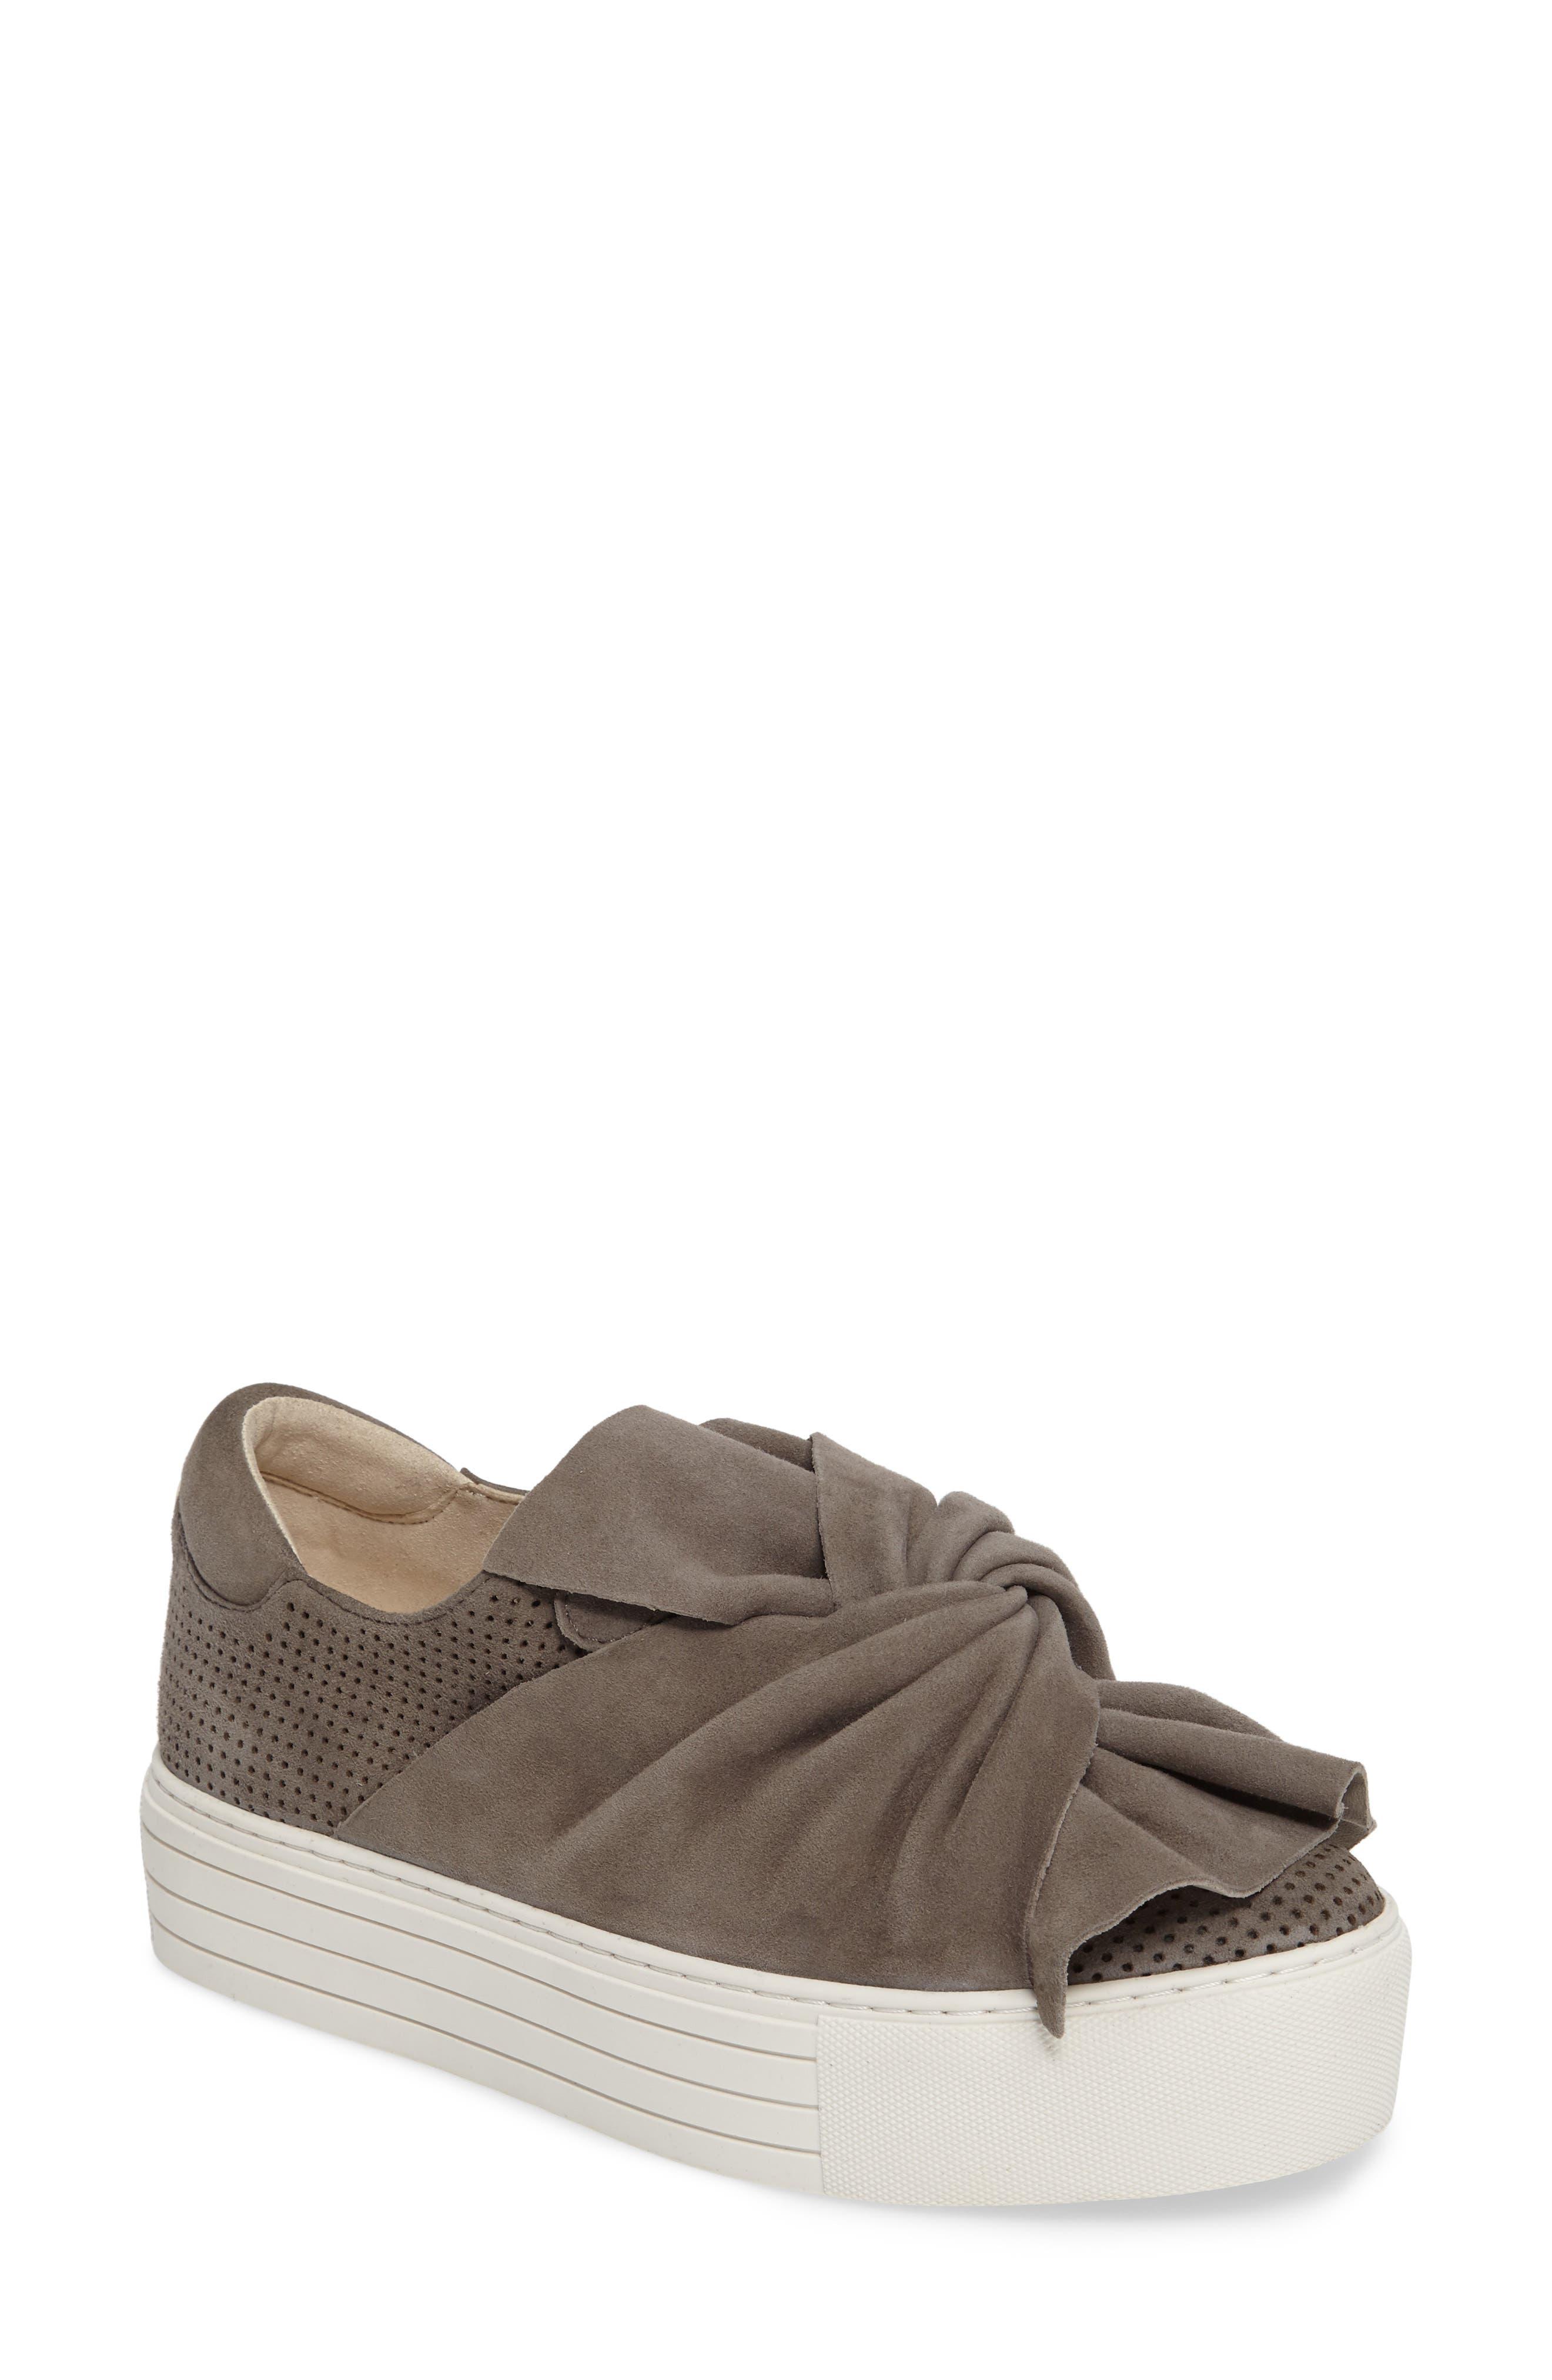 KENNETH COLE NEW YORK Kenneth Cole Aaron 2 Flatform Sneaker